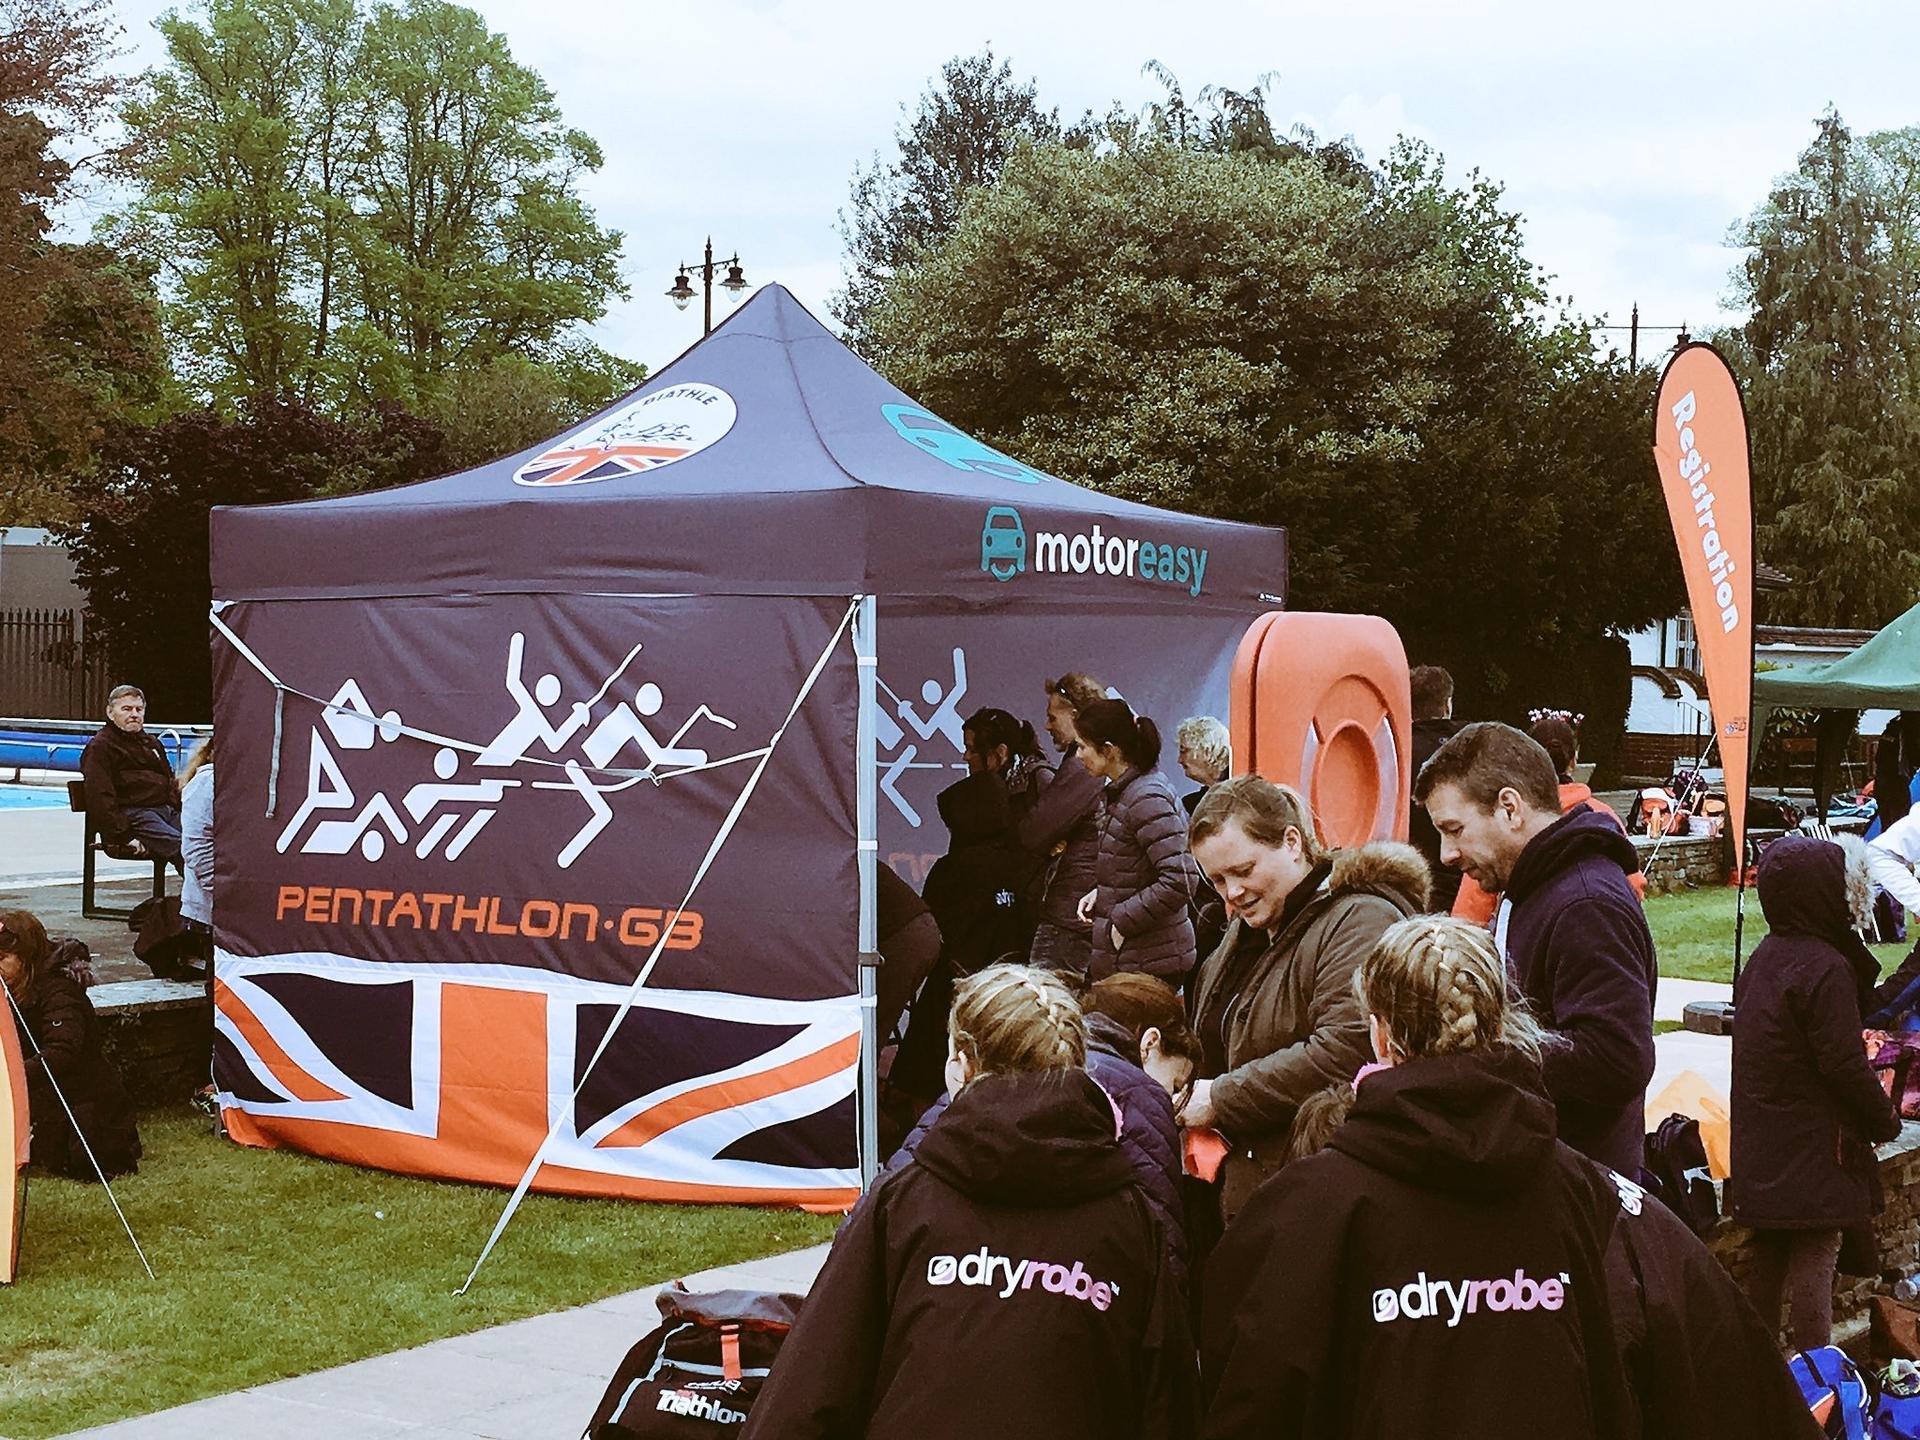 MotorEasy Sponsorship Pentathlon GB Biathle Marquee